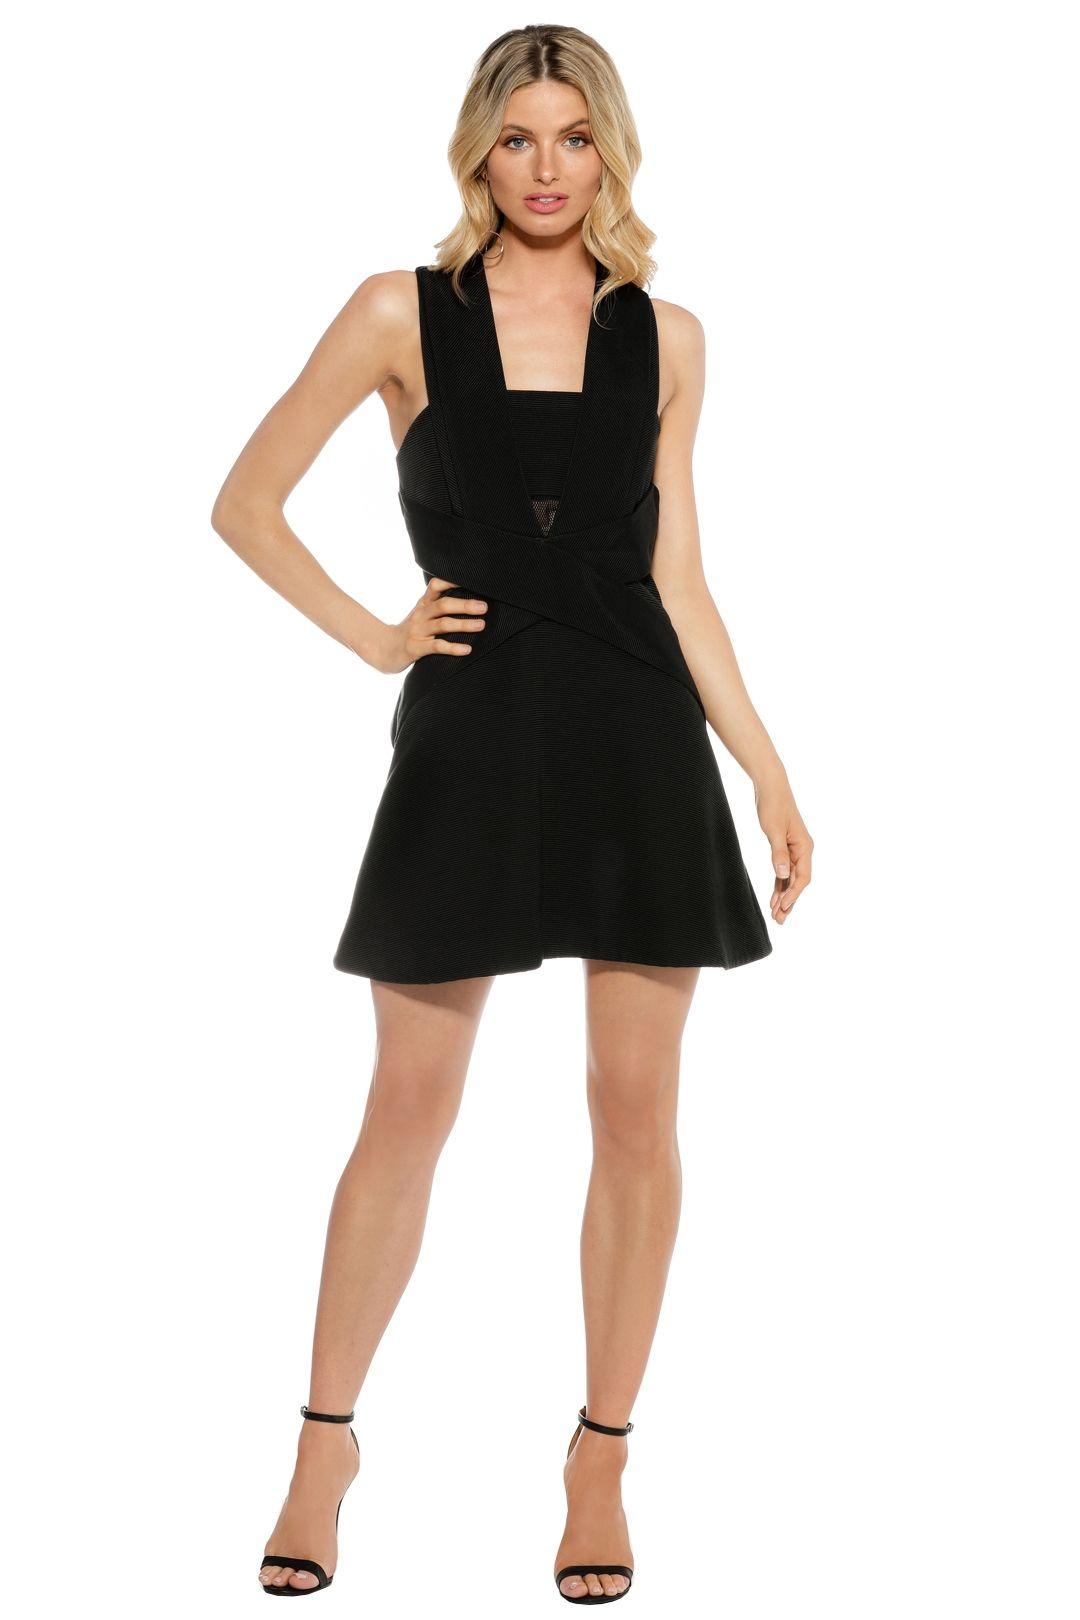 Camilla & Marc - Responsive Dress - Black - Front